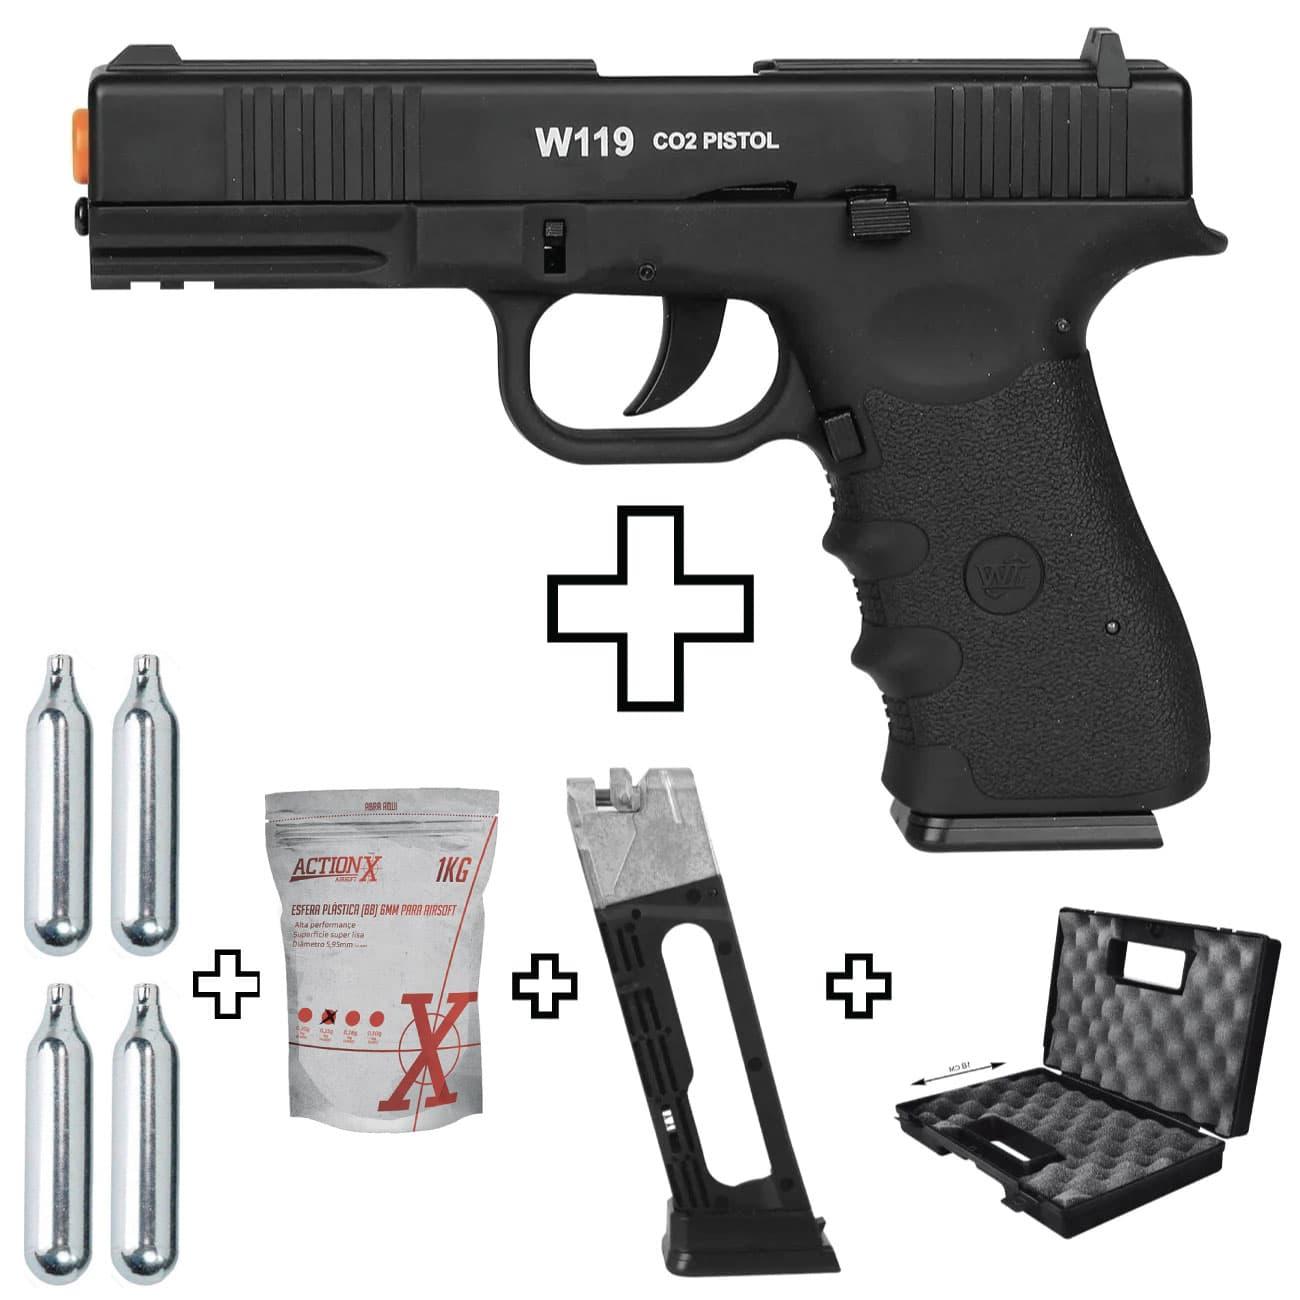 Pistola Airsoft Glock W119 Metal Co2 6mm + Magazine + Maleta